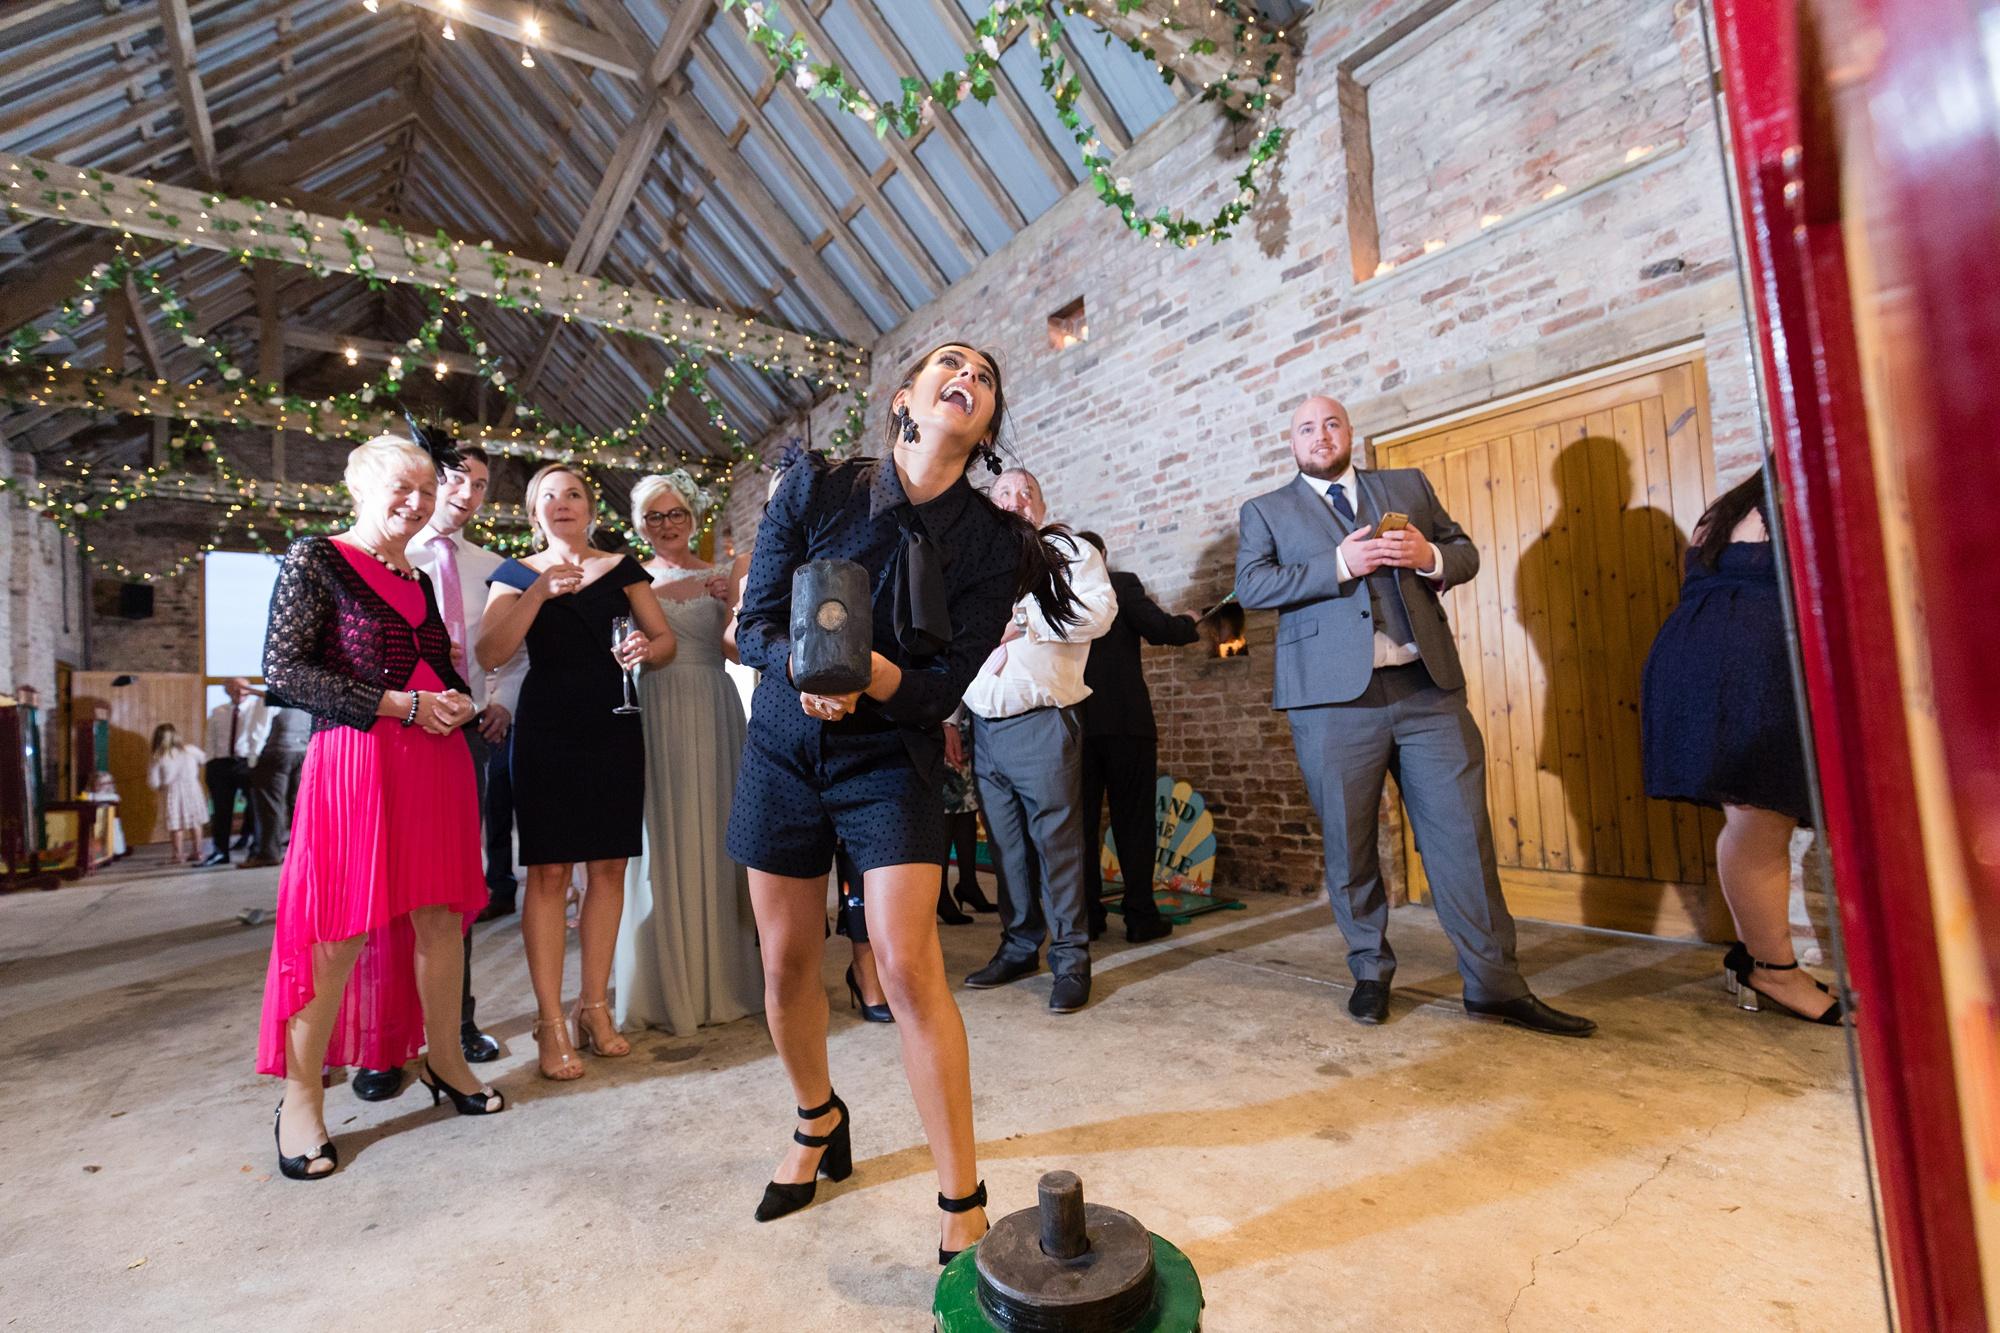 Barmbyfield Barn Wedding Photography guest having a fun time at indoor fun fair